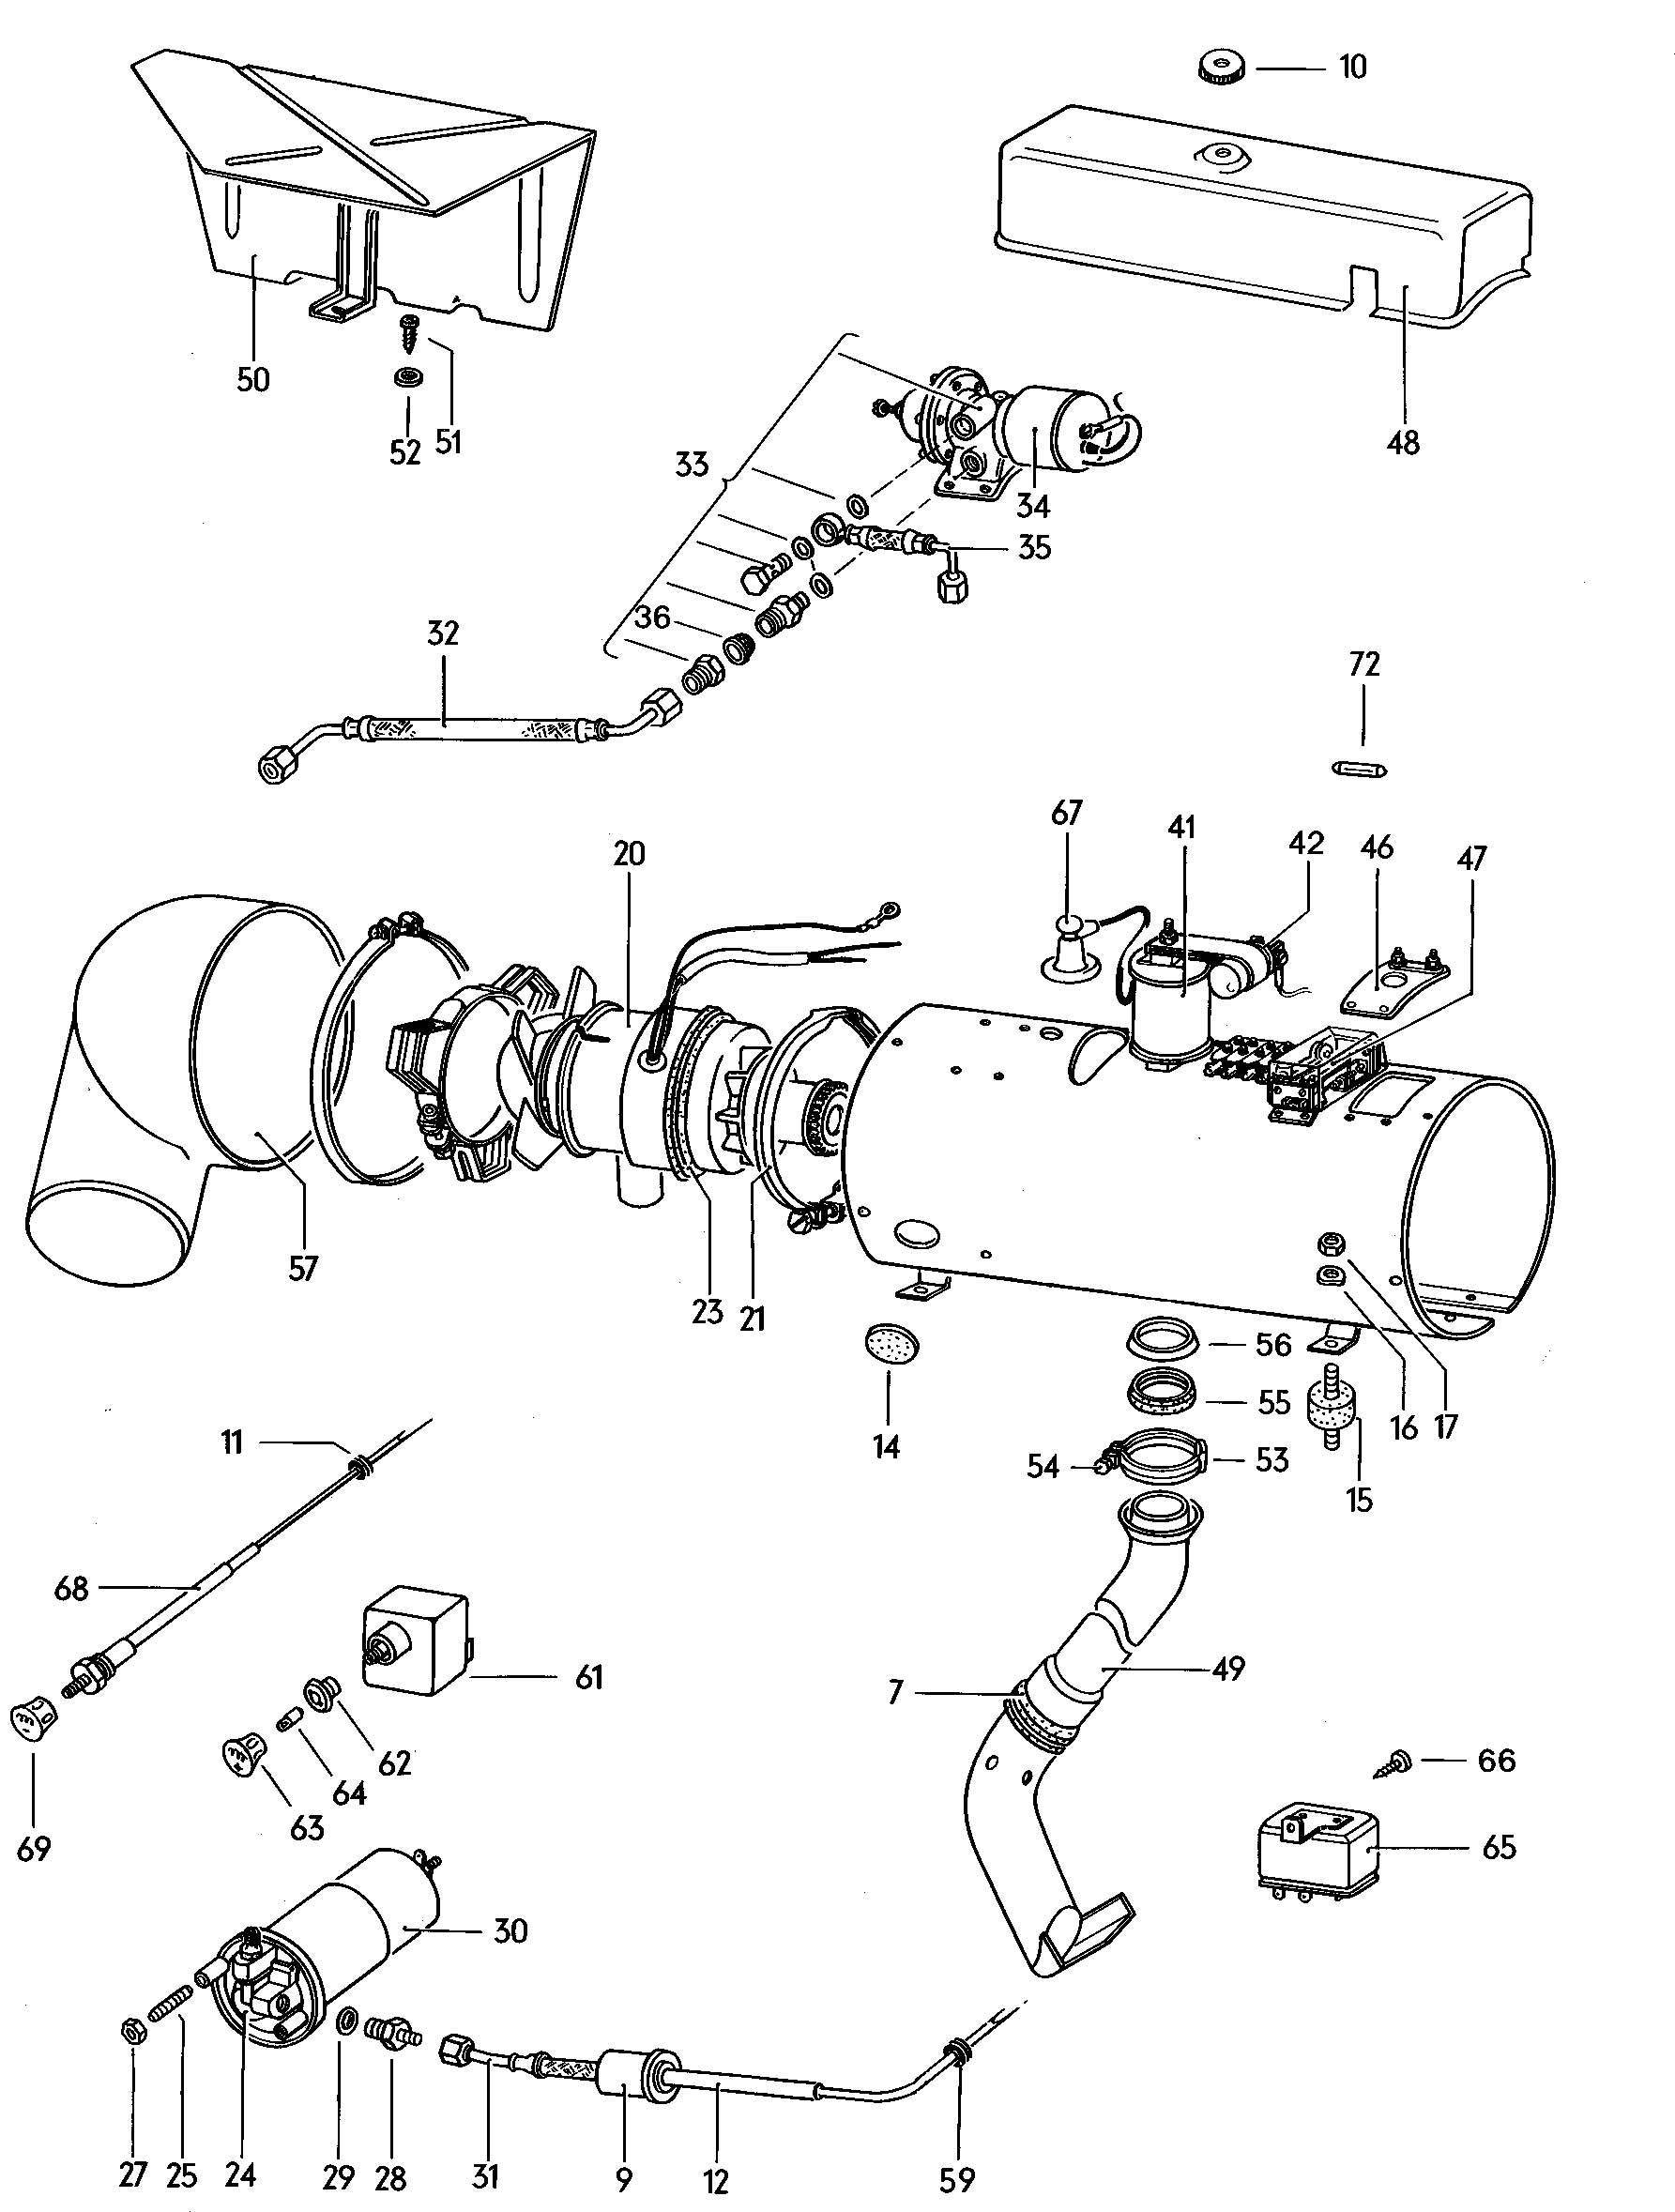 Volkswagen Thing Stationary Heater See Illustration